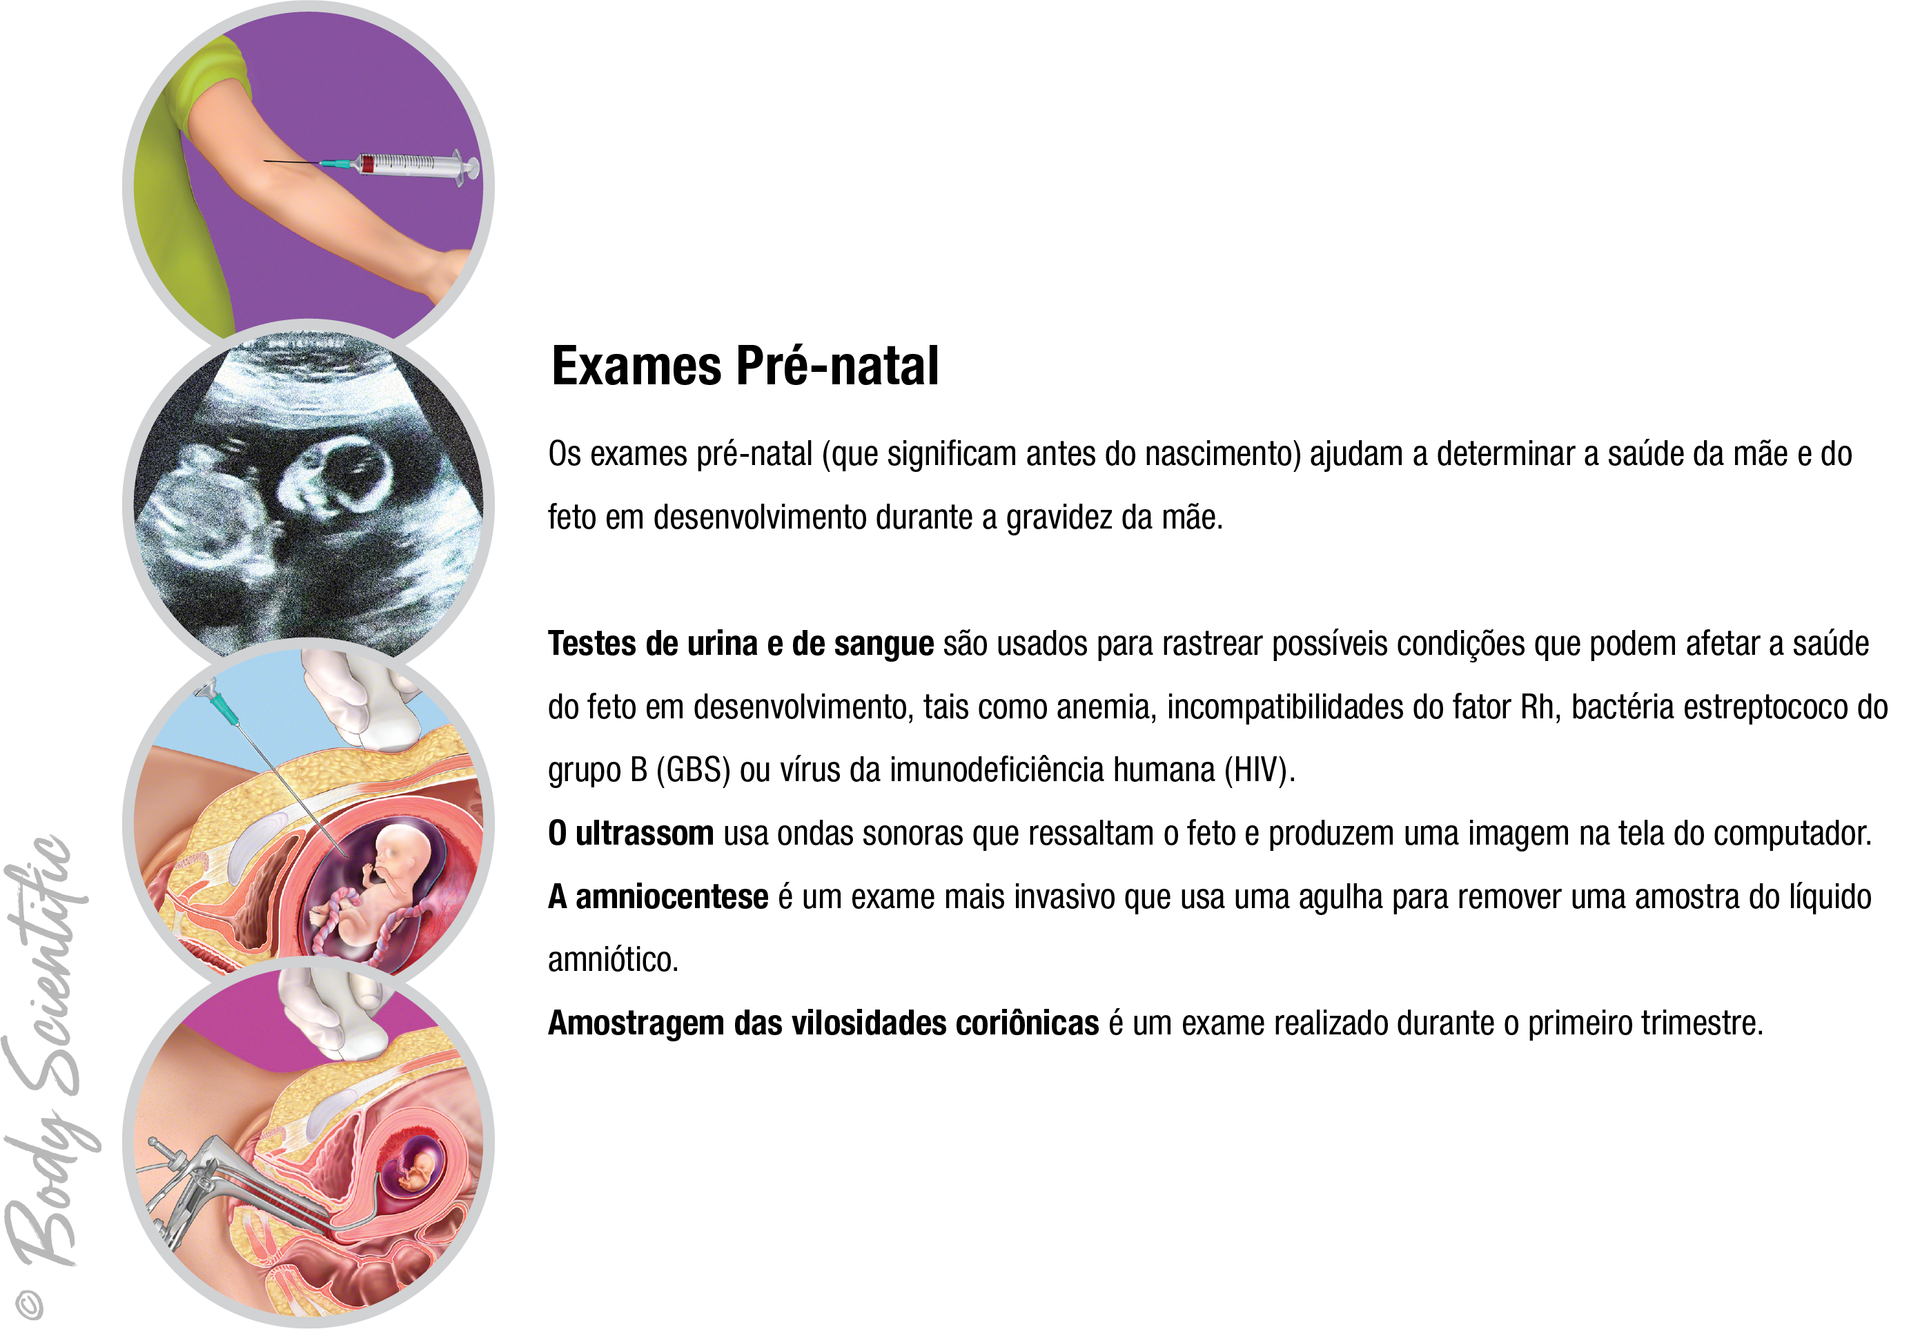 Exames Pré-natal